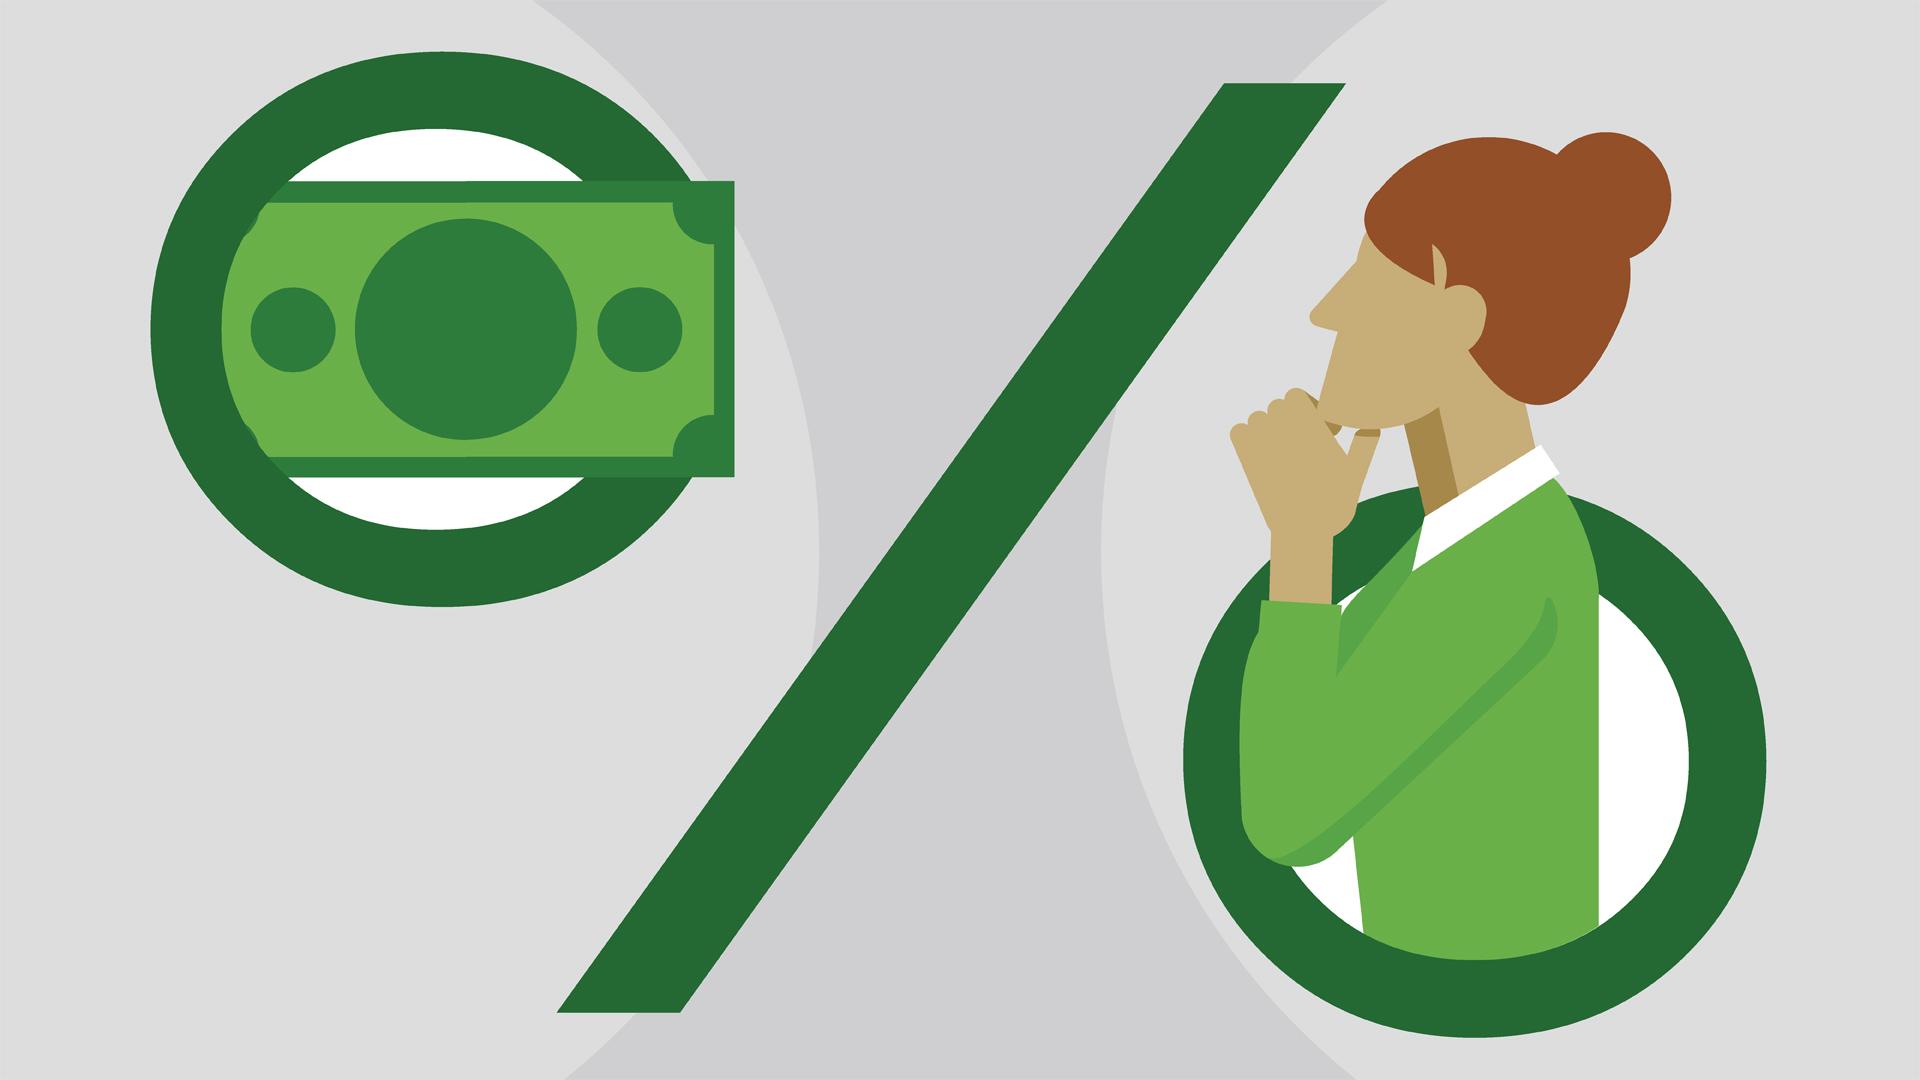 Financial clipart profitability ratio. Running a profitable business